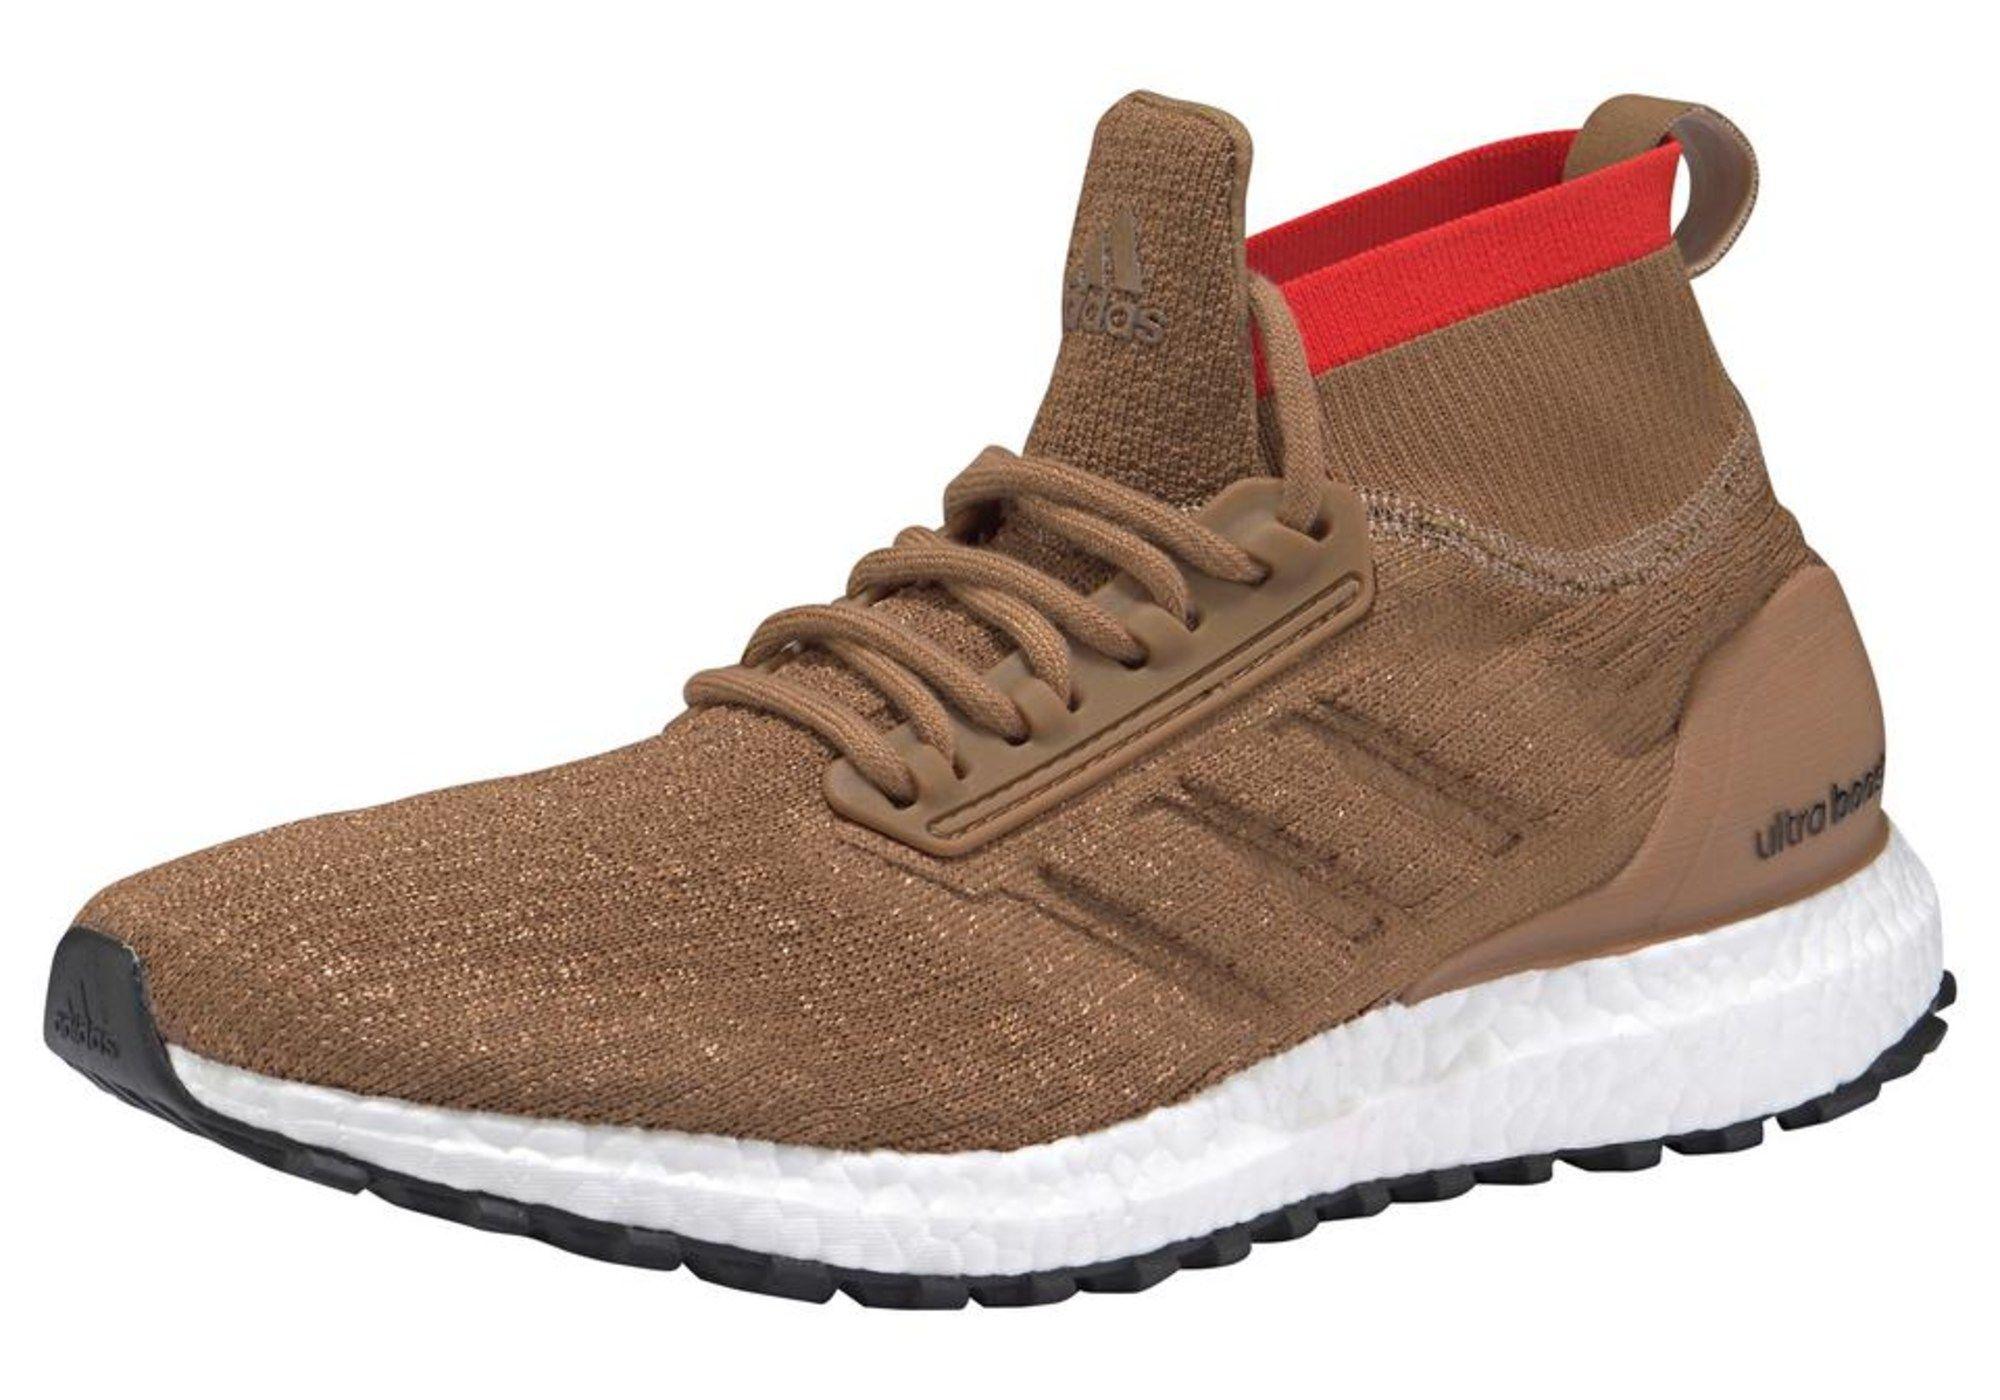 new product fc252 47e3b AboutYou ADIDASPERFORMANCE Laufschuhe Schuhe Sneaker Sportschuhe  Herren ADIDAS